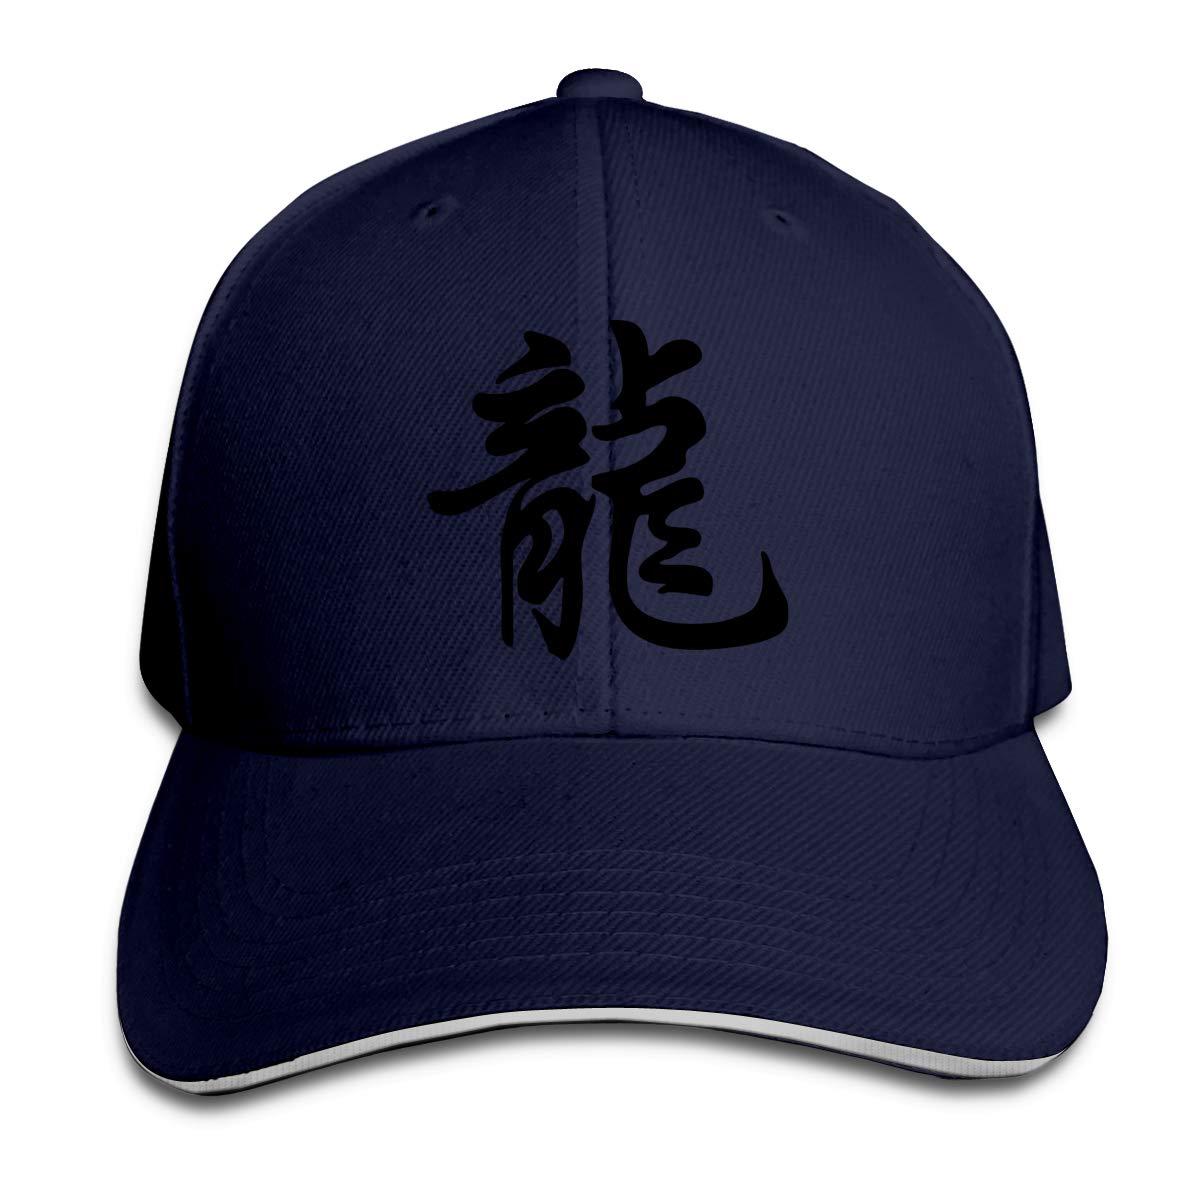 cd000dd0b Amazon.com: Baseball Cap Golf Hats Unisex Trucker Caps Chinese ...